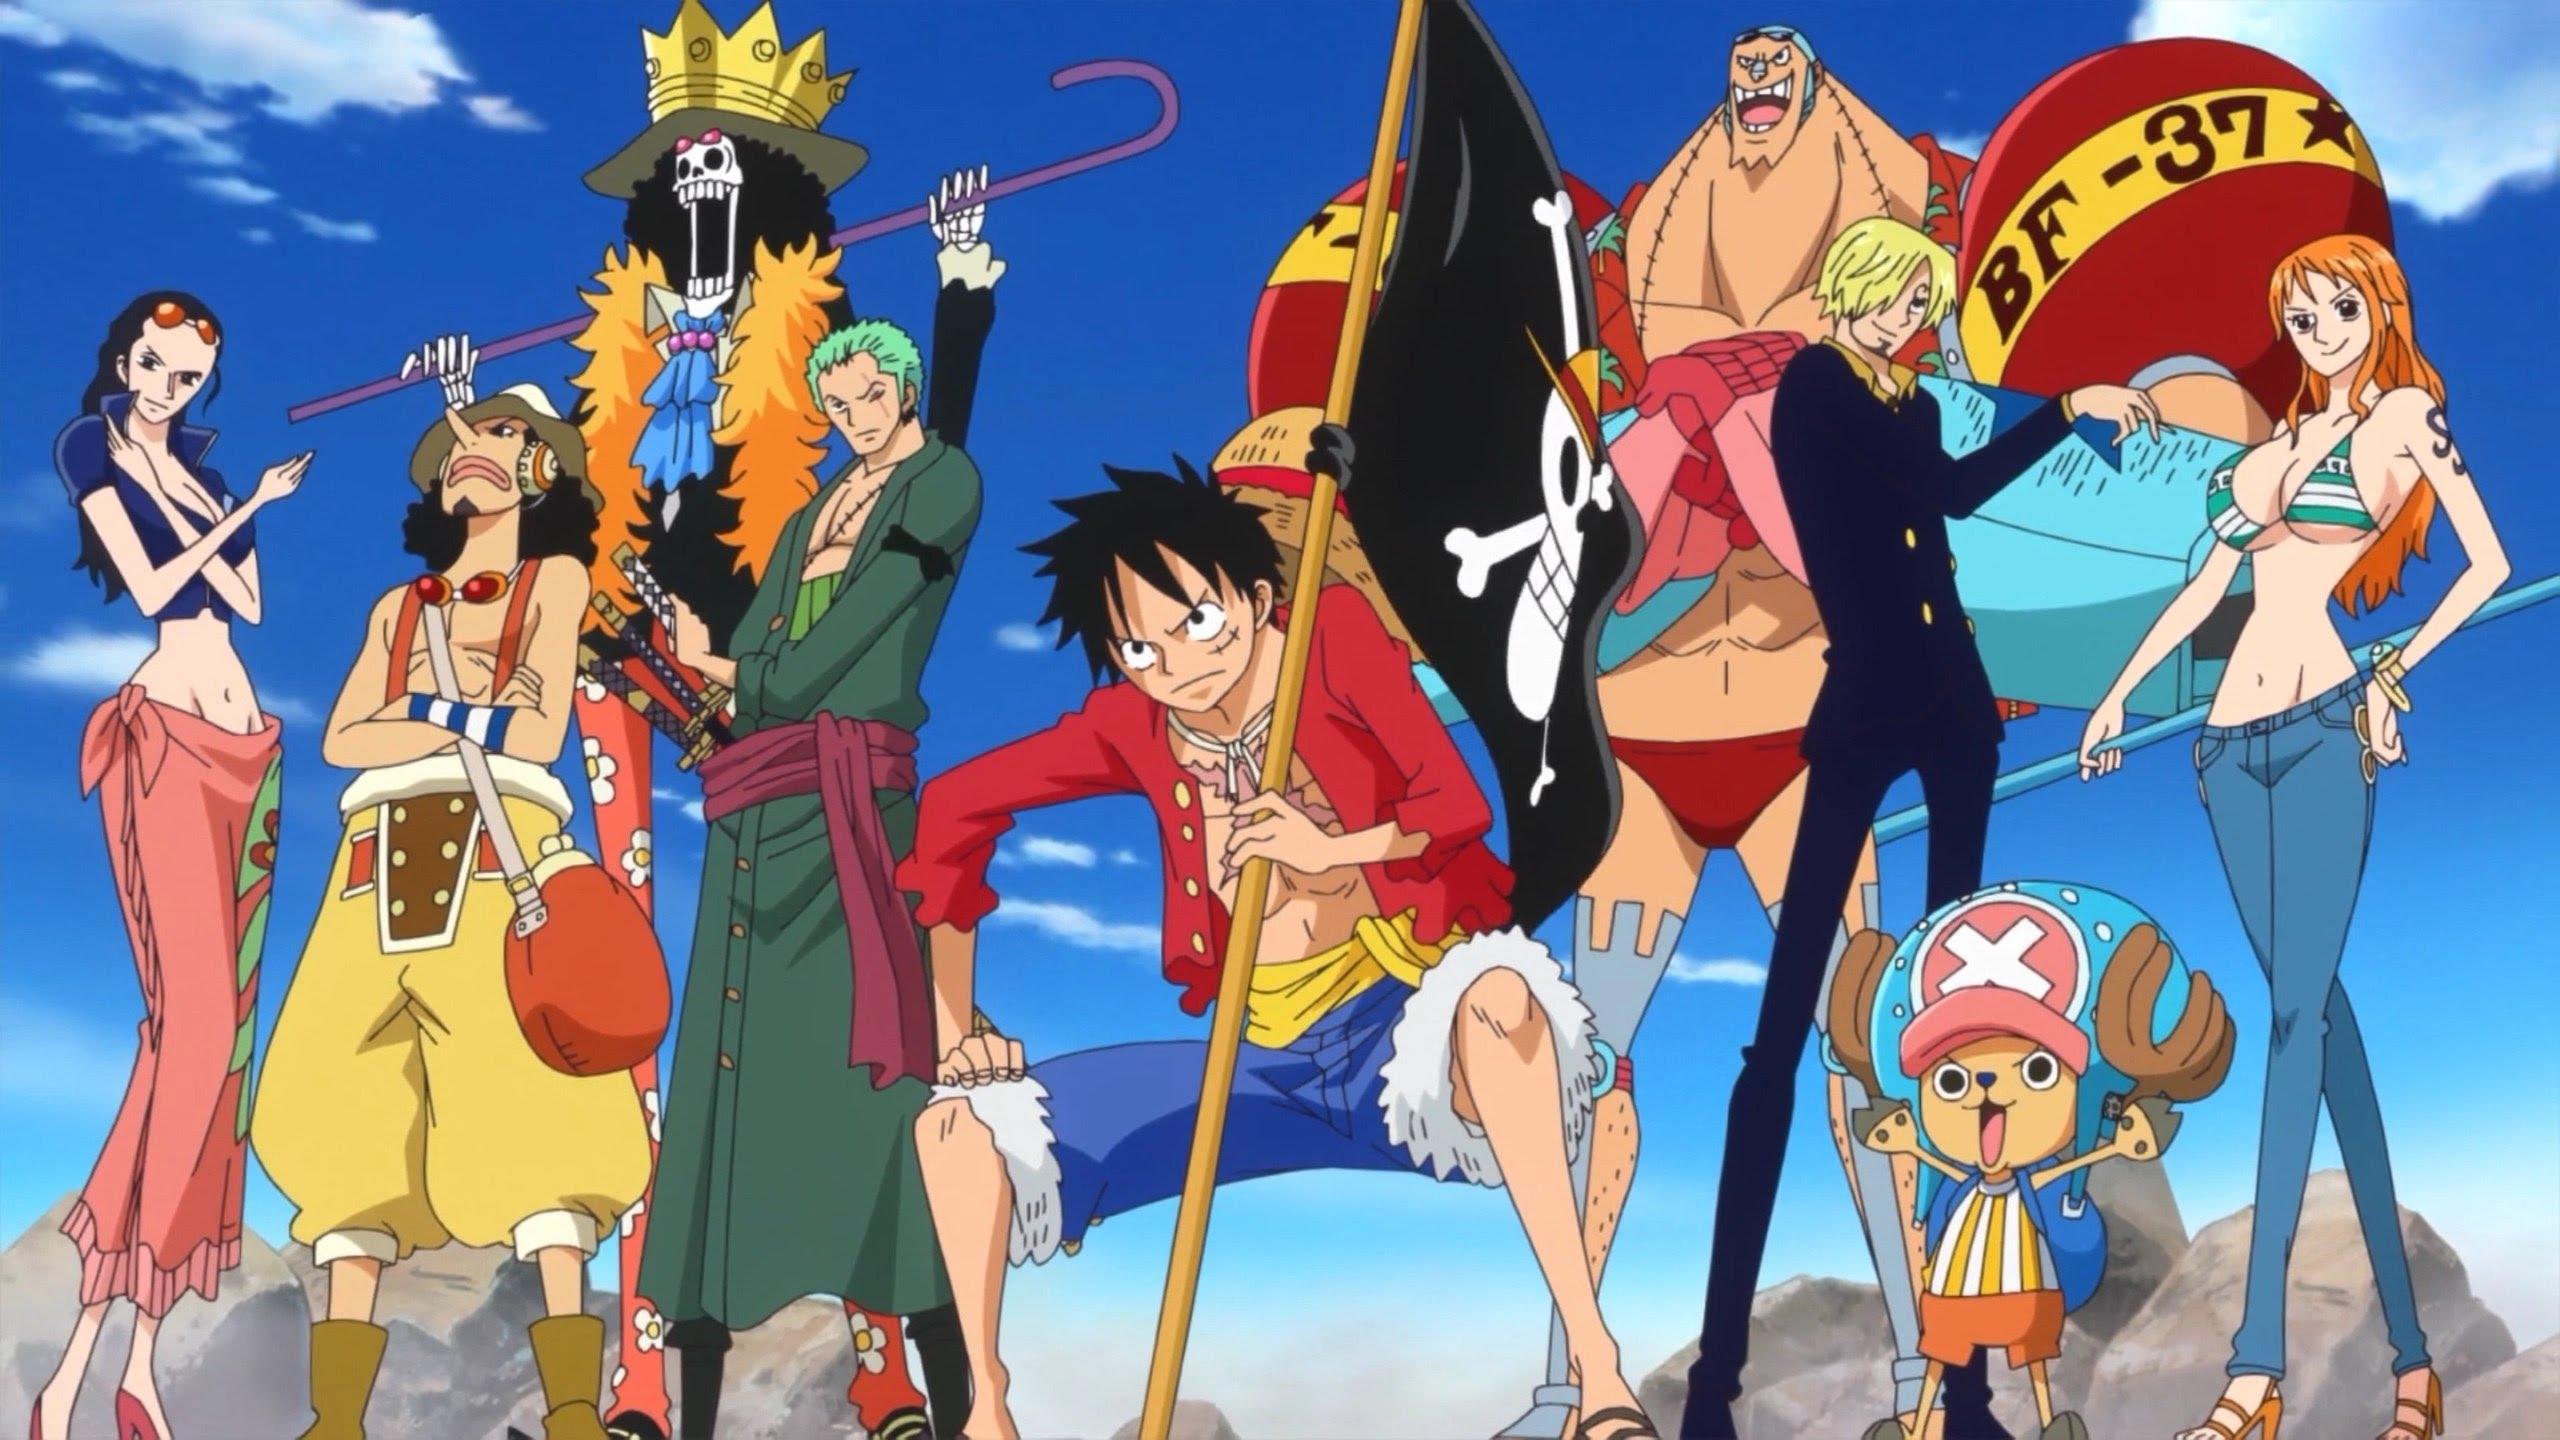 353c54e9e Land Anime Japan War One Piece Fighting Action Pirates Adventure Art Poster  Print 4x6 8.5x11 11x17 18x24 24x36 36x48